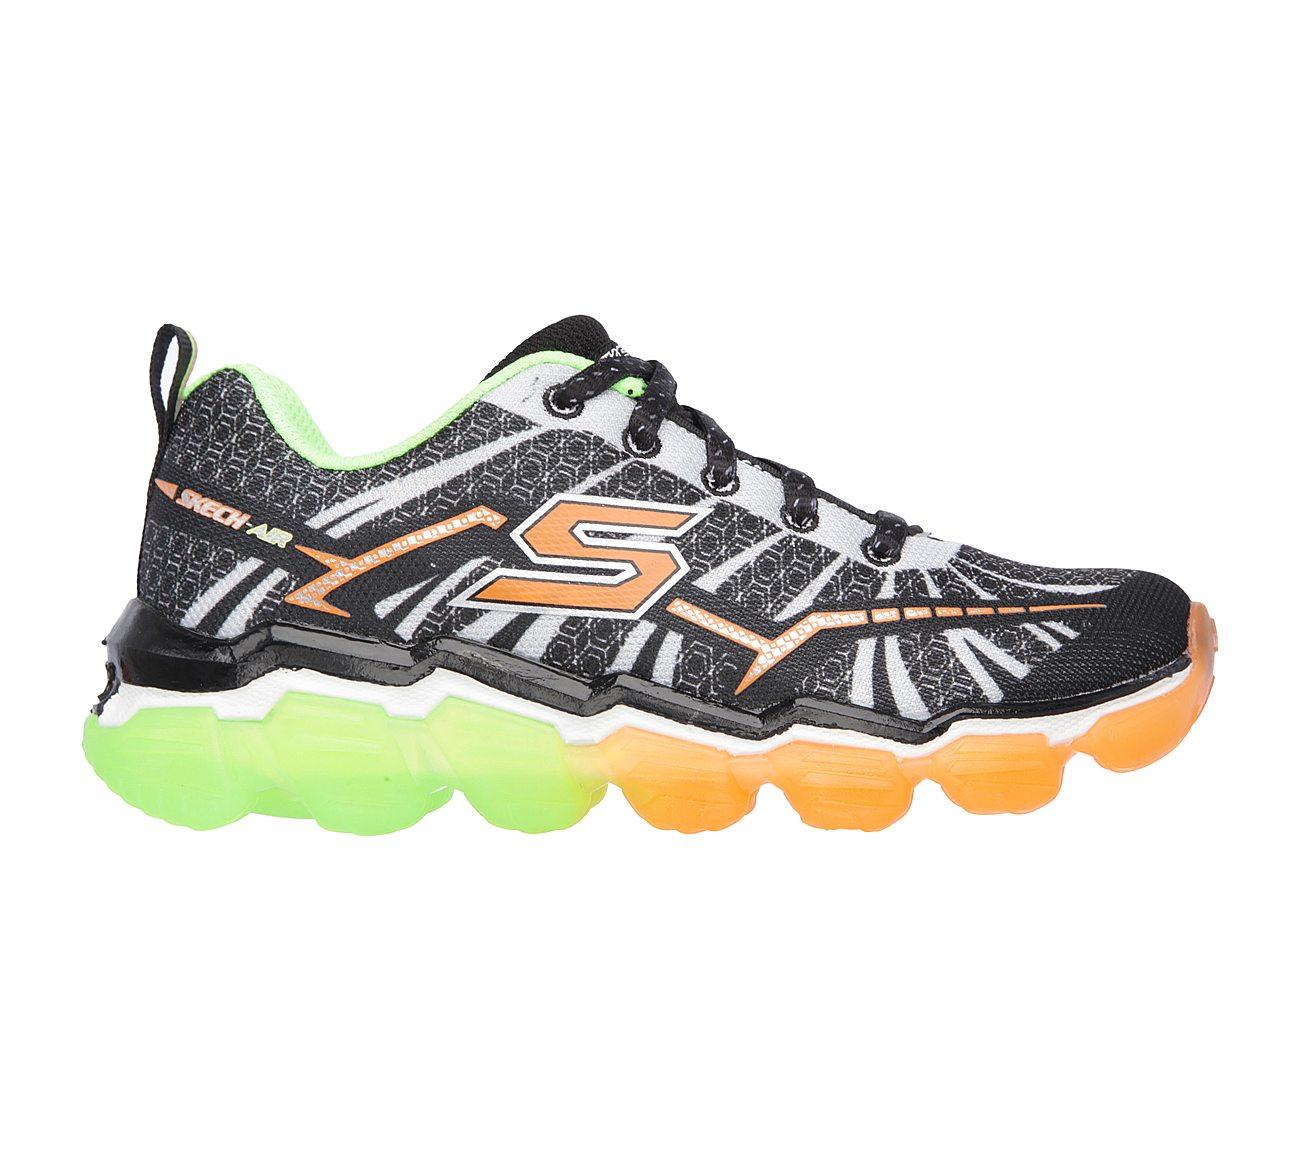 24422e470070 Buy SKECHERS Skech-Air - Turbo Shocks Skech-Air Shoes only  55.00